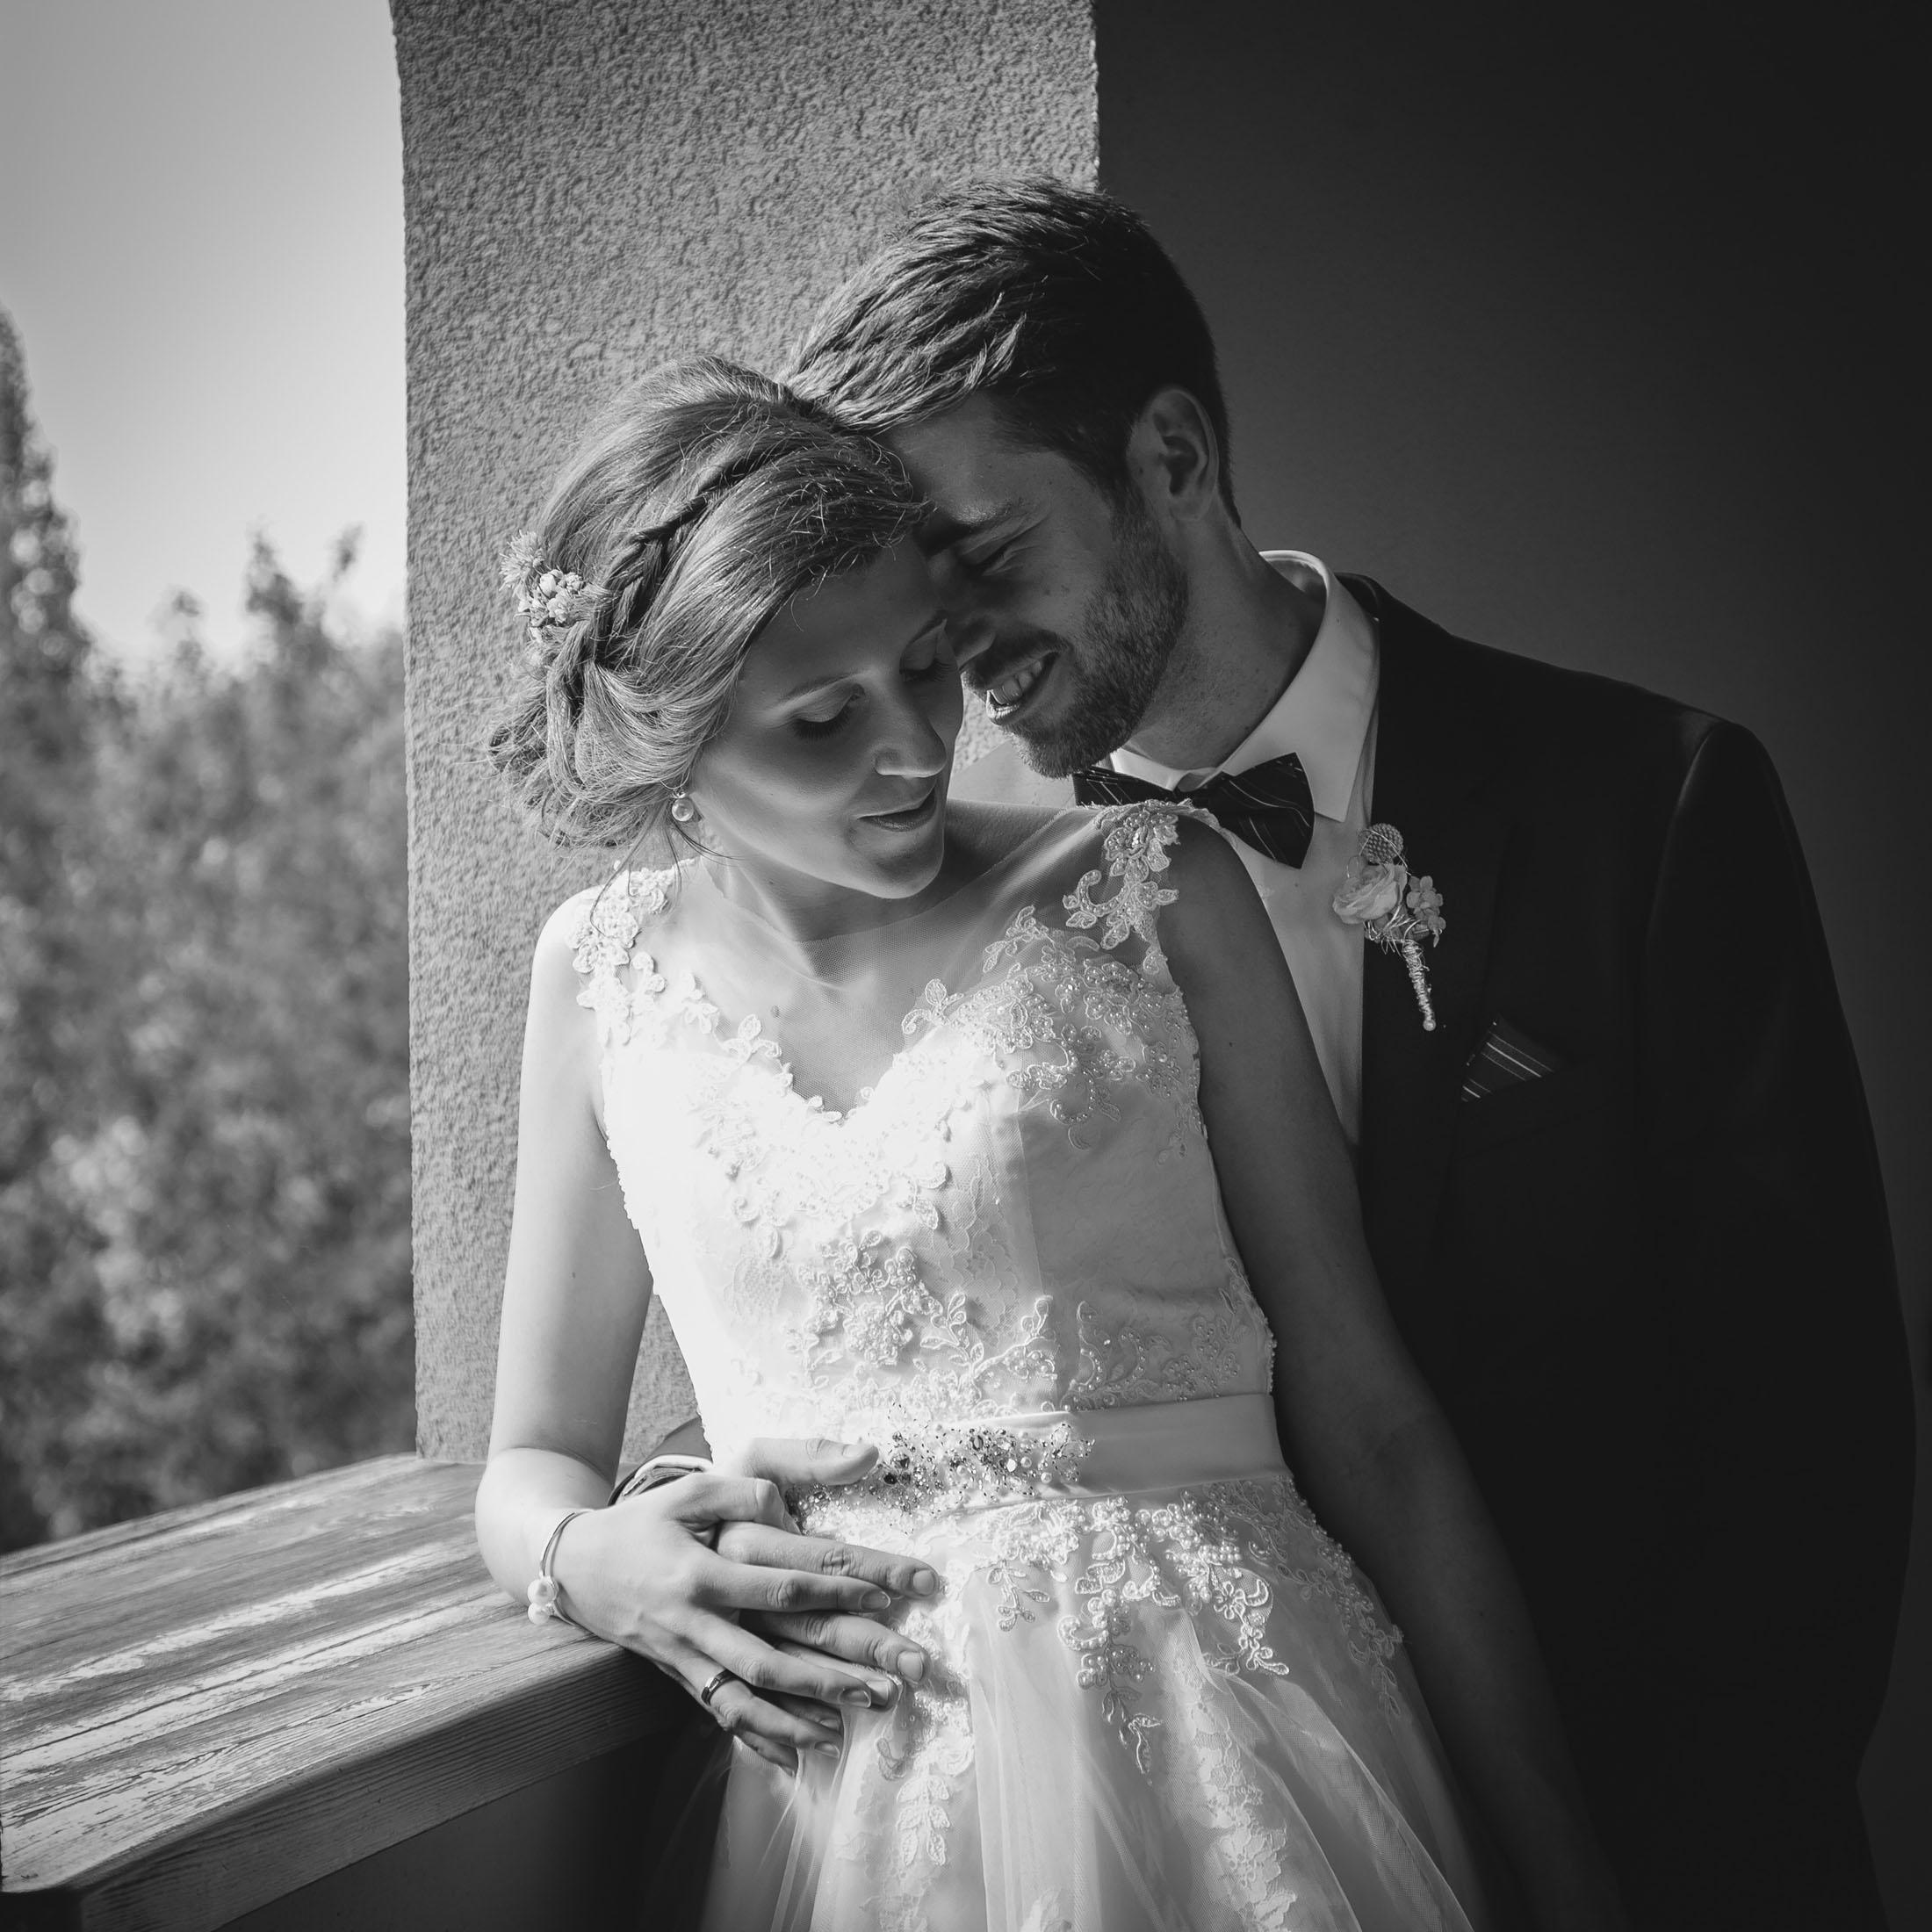 Hochzeit Karina & Johannes Umarmung schwarz-weiss im Weinschloss Thaller